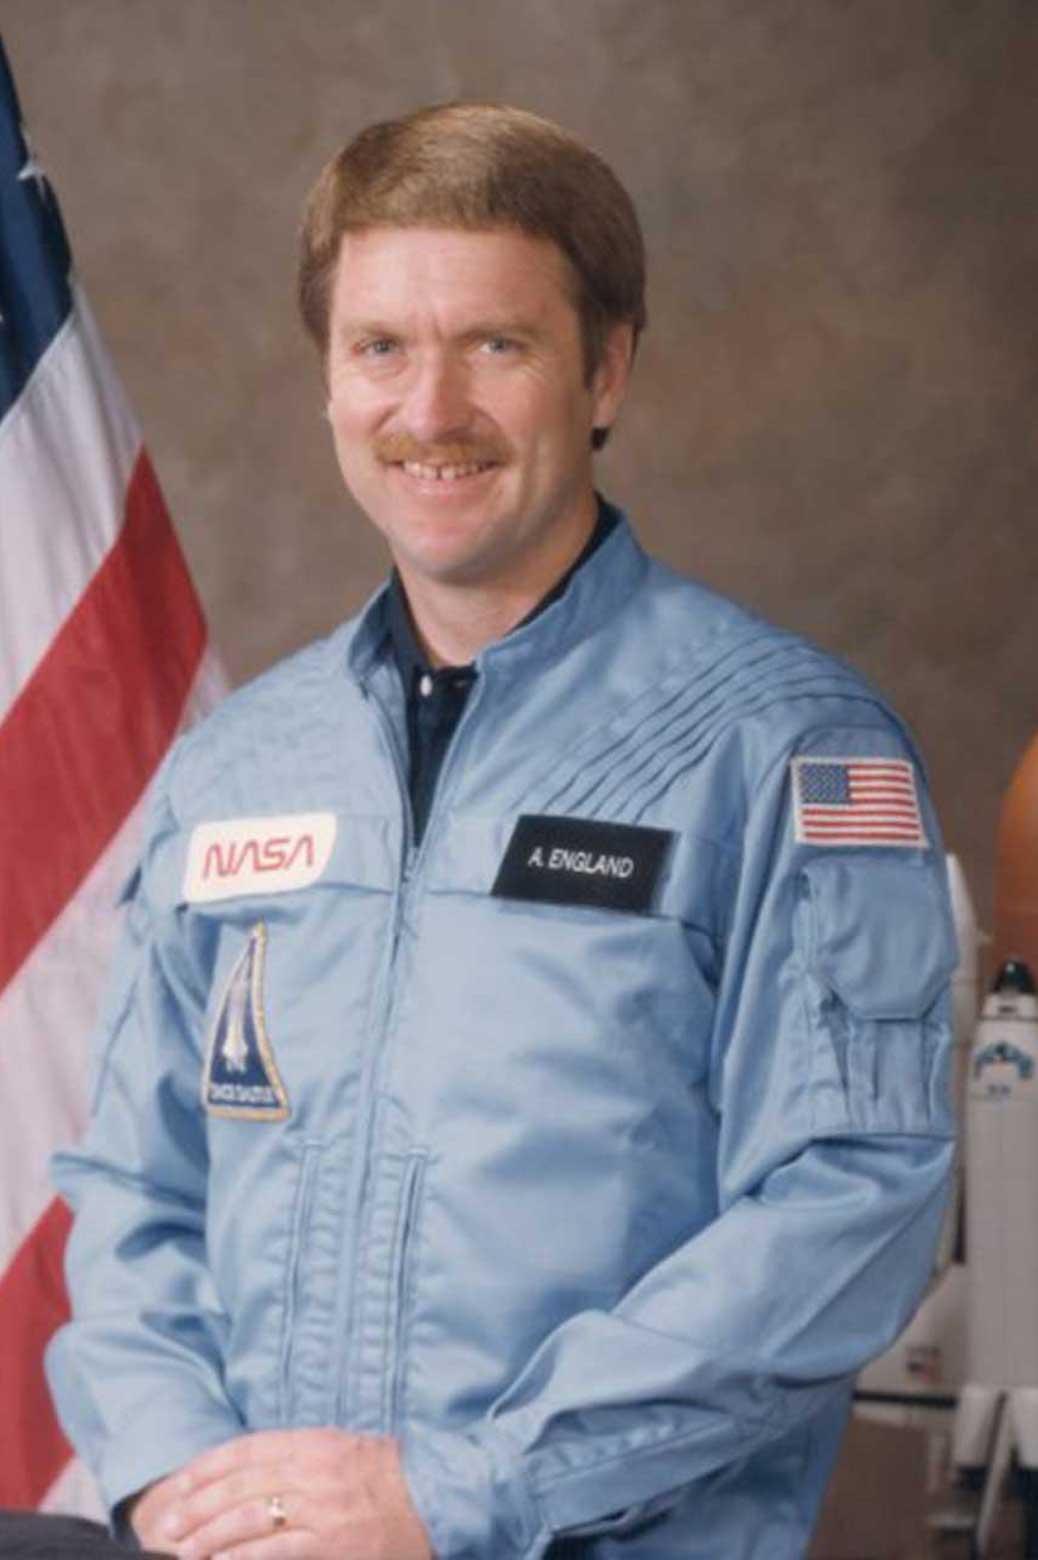 Portrait of Tony England in NASA uniform